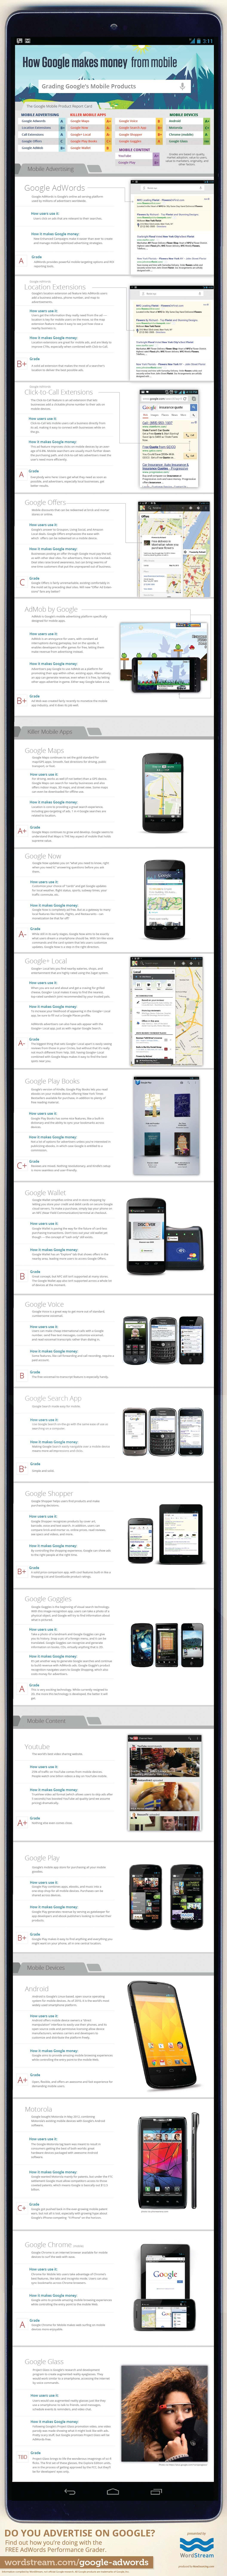 Google Mobile Monetization-Infographic